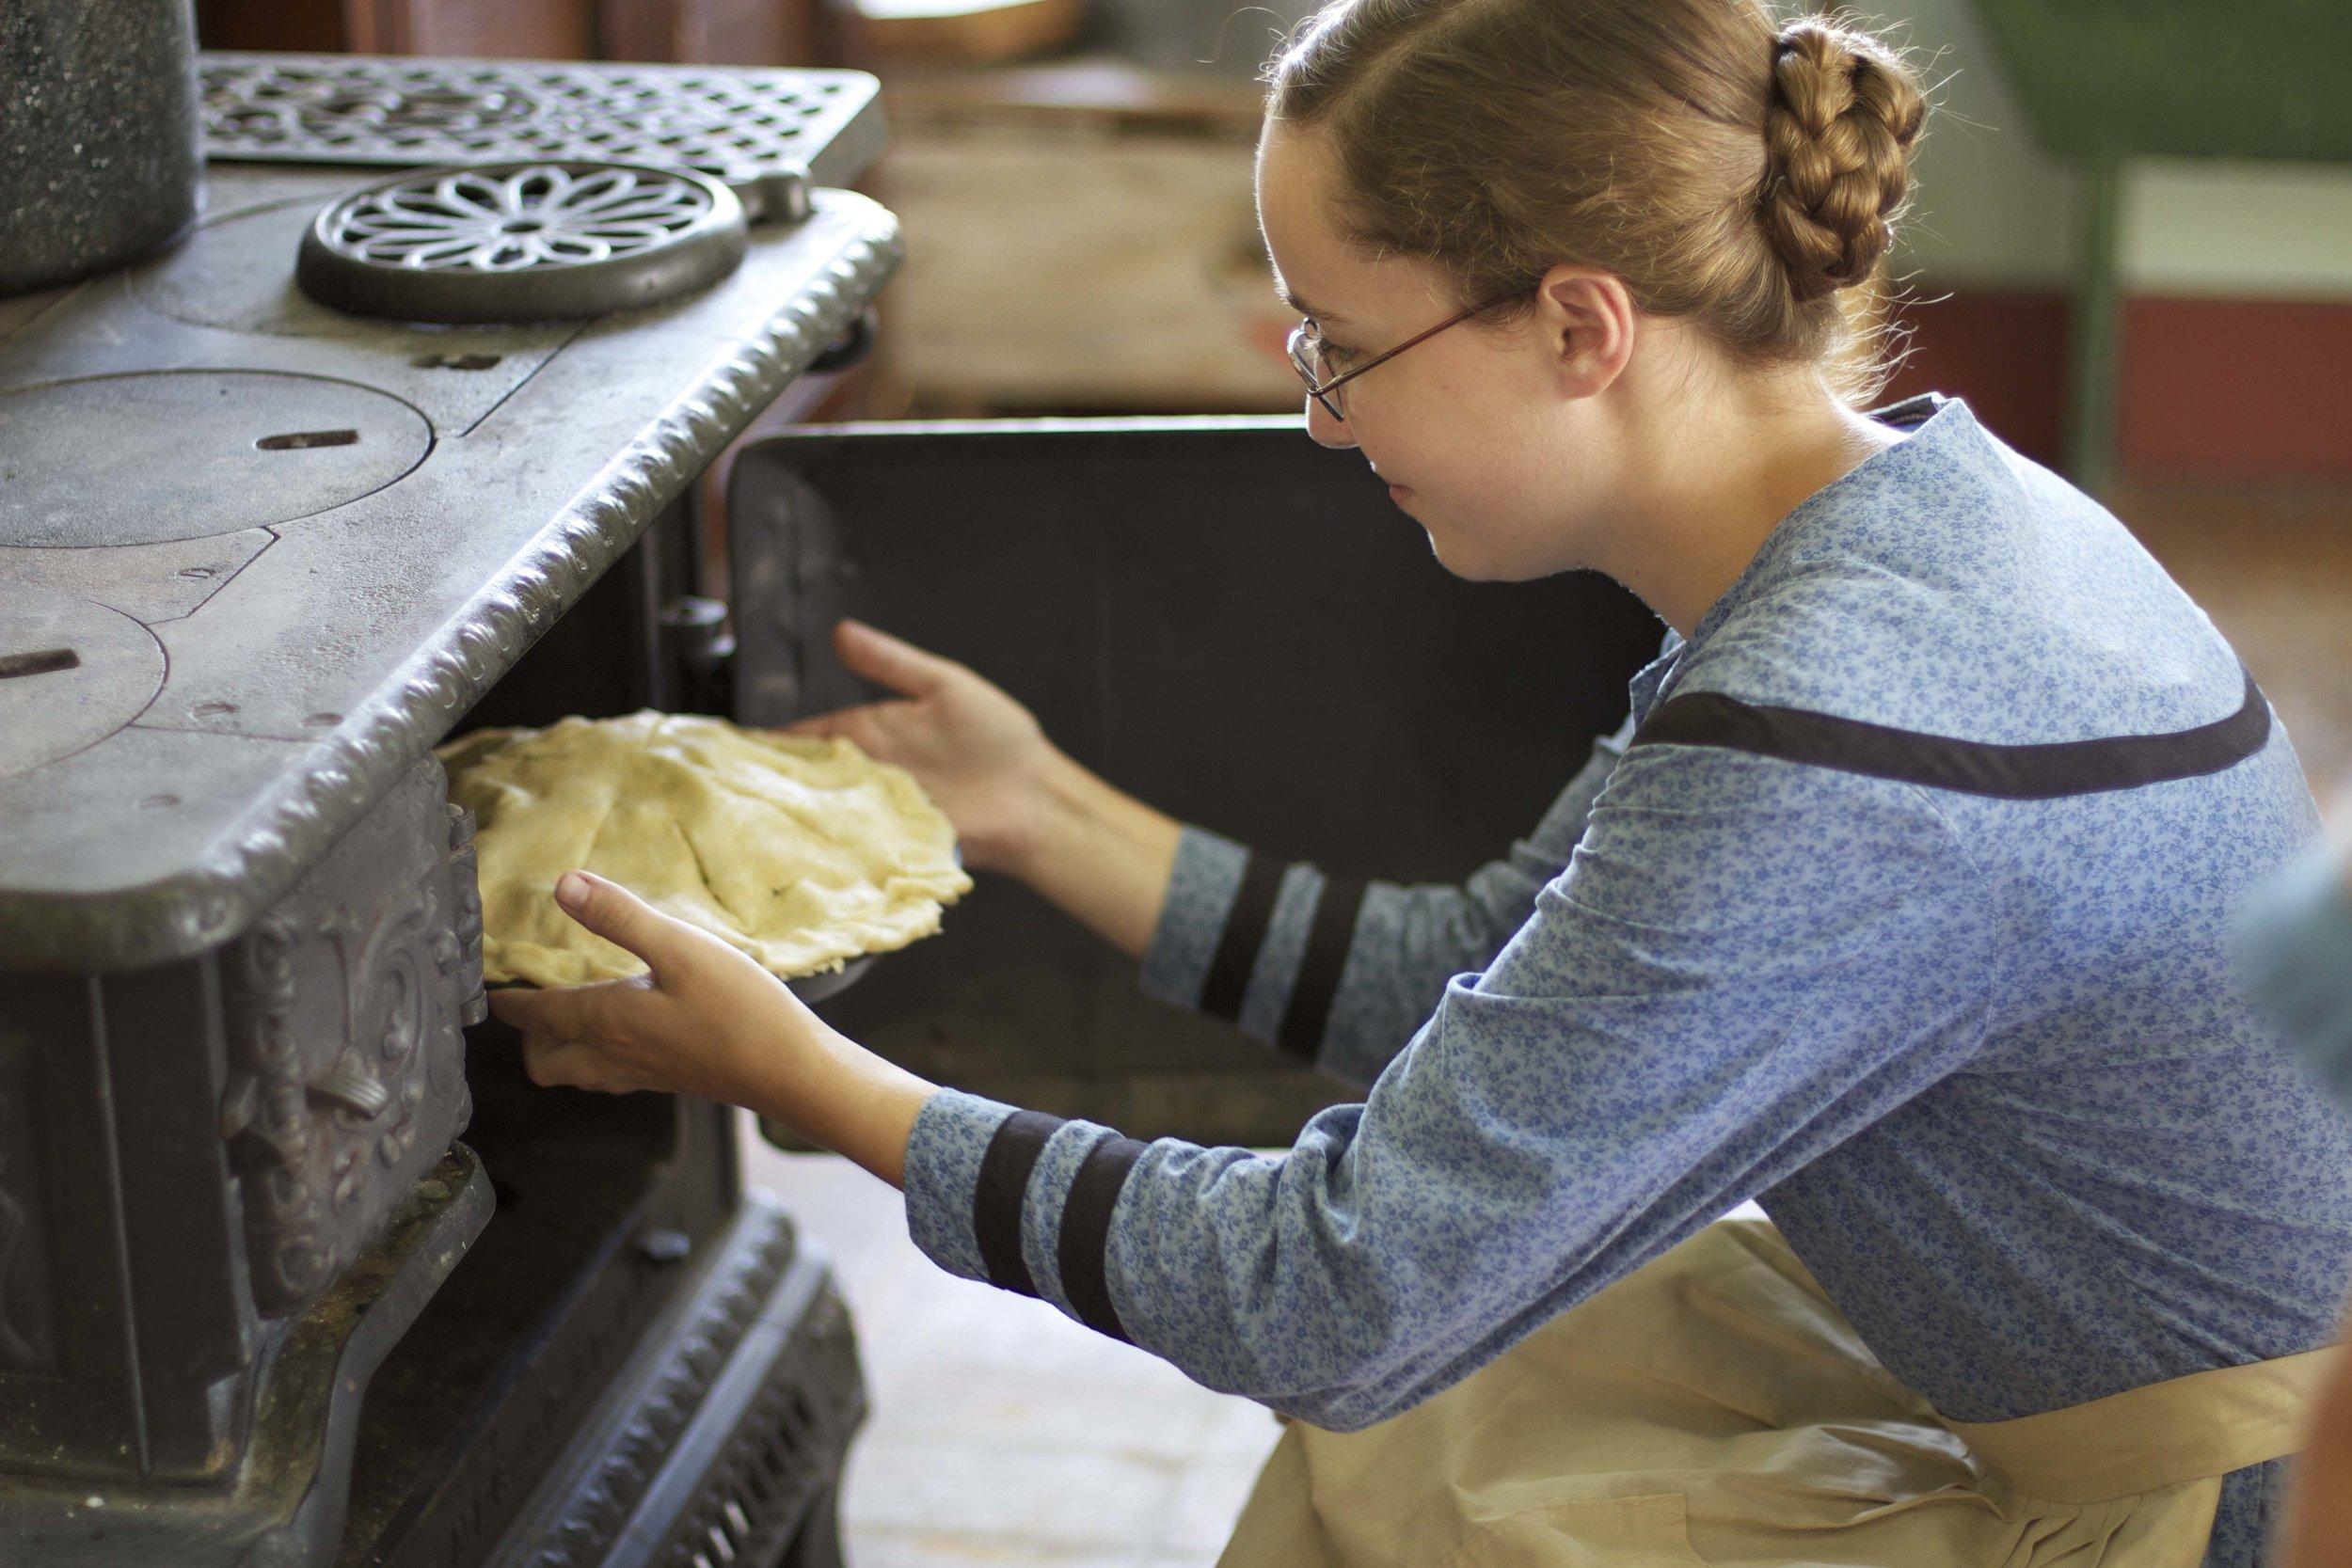 baking-a-pie_1.jpg